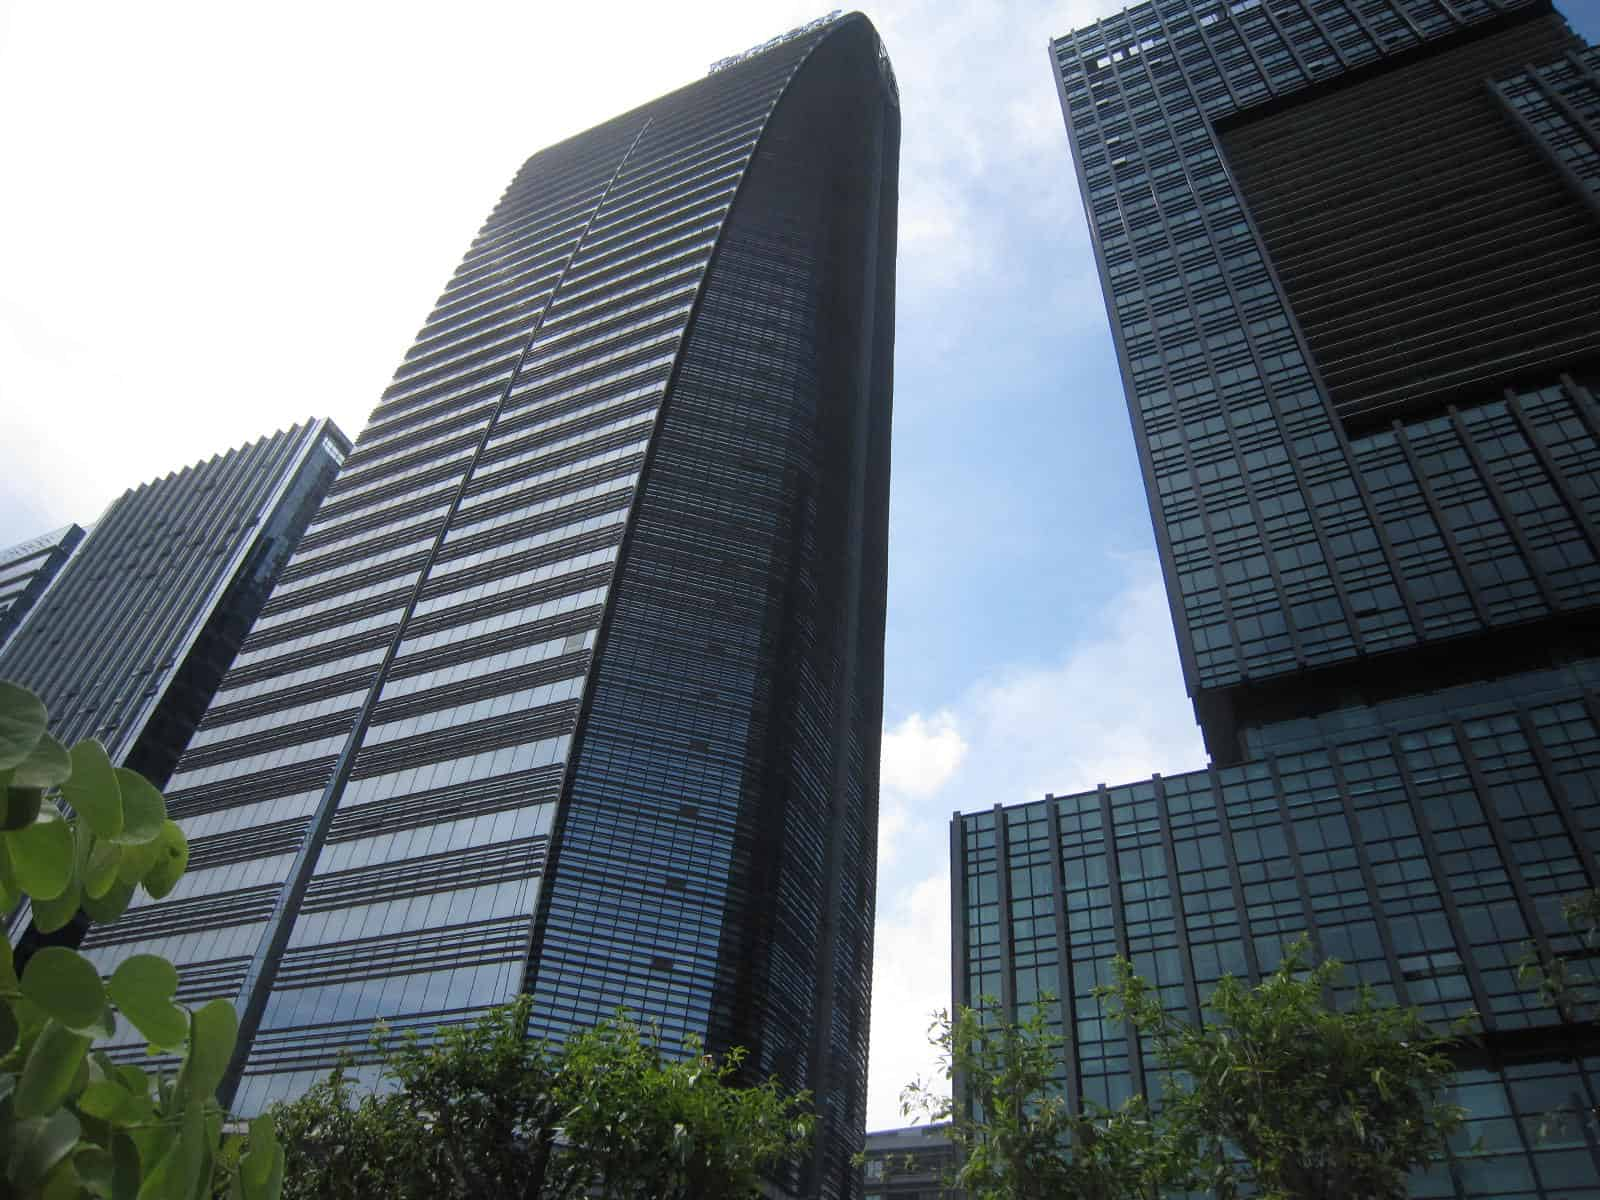 Beijing Qinhuai Technology Obtains Record $570 Billion in